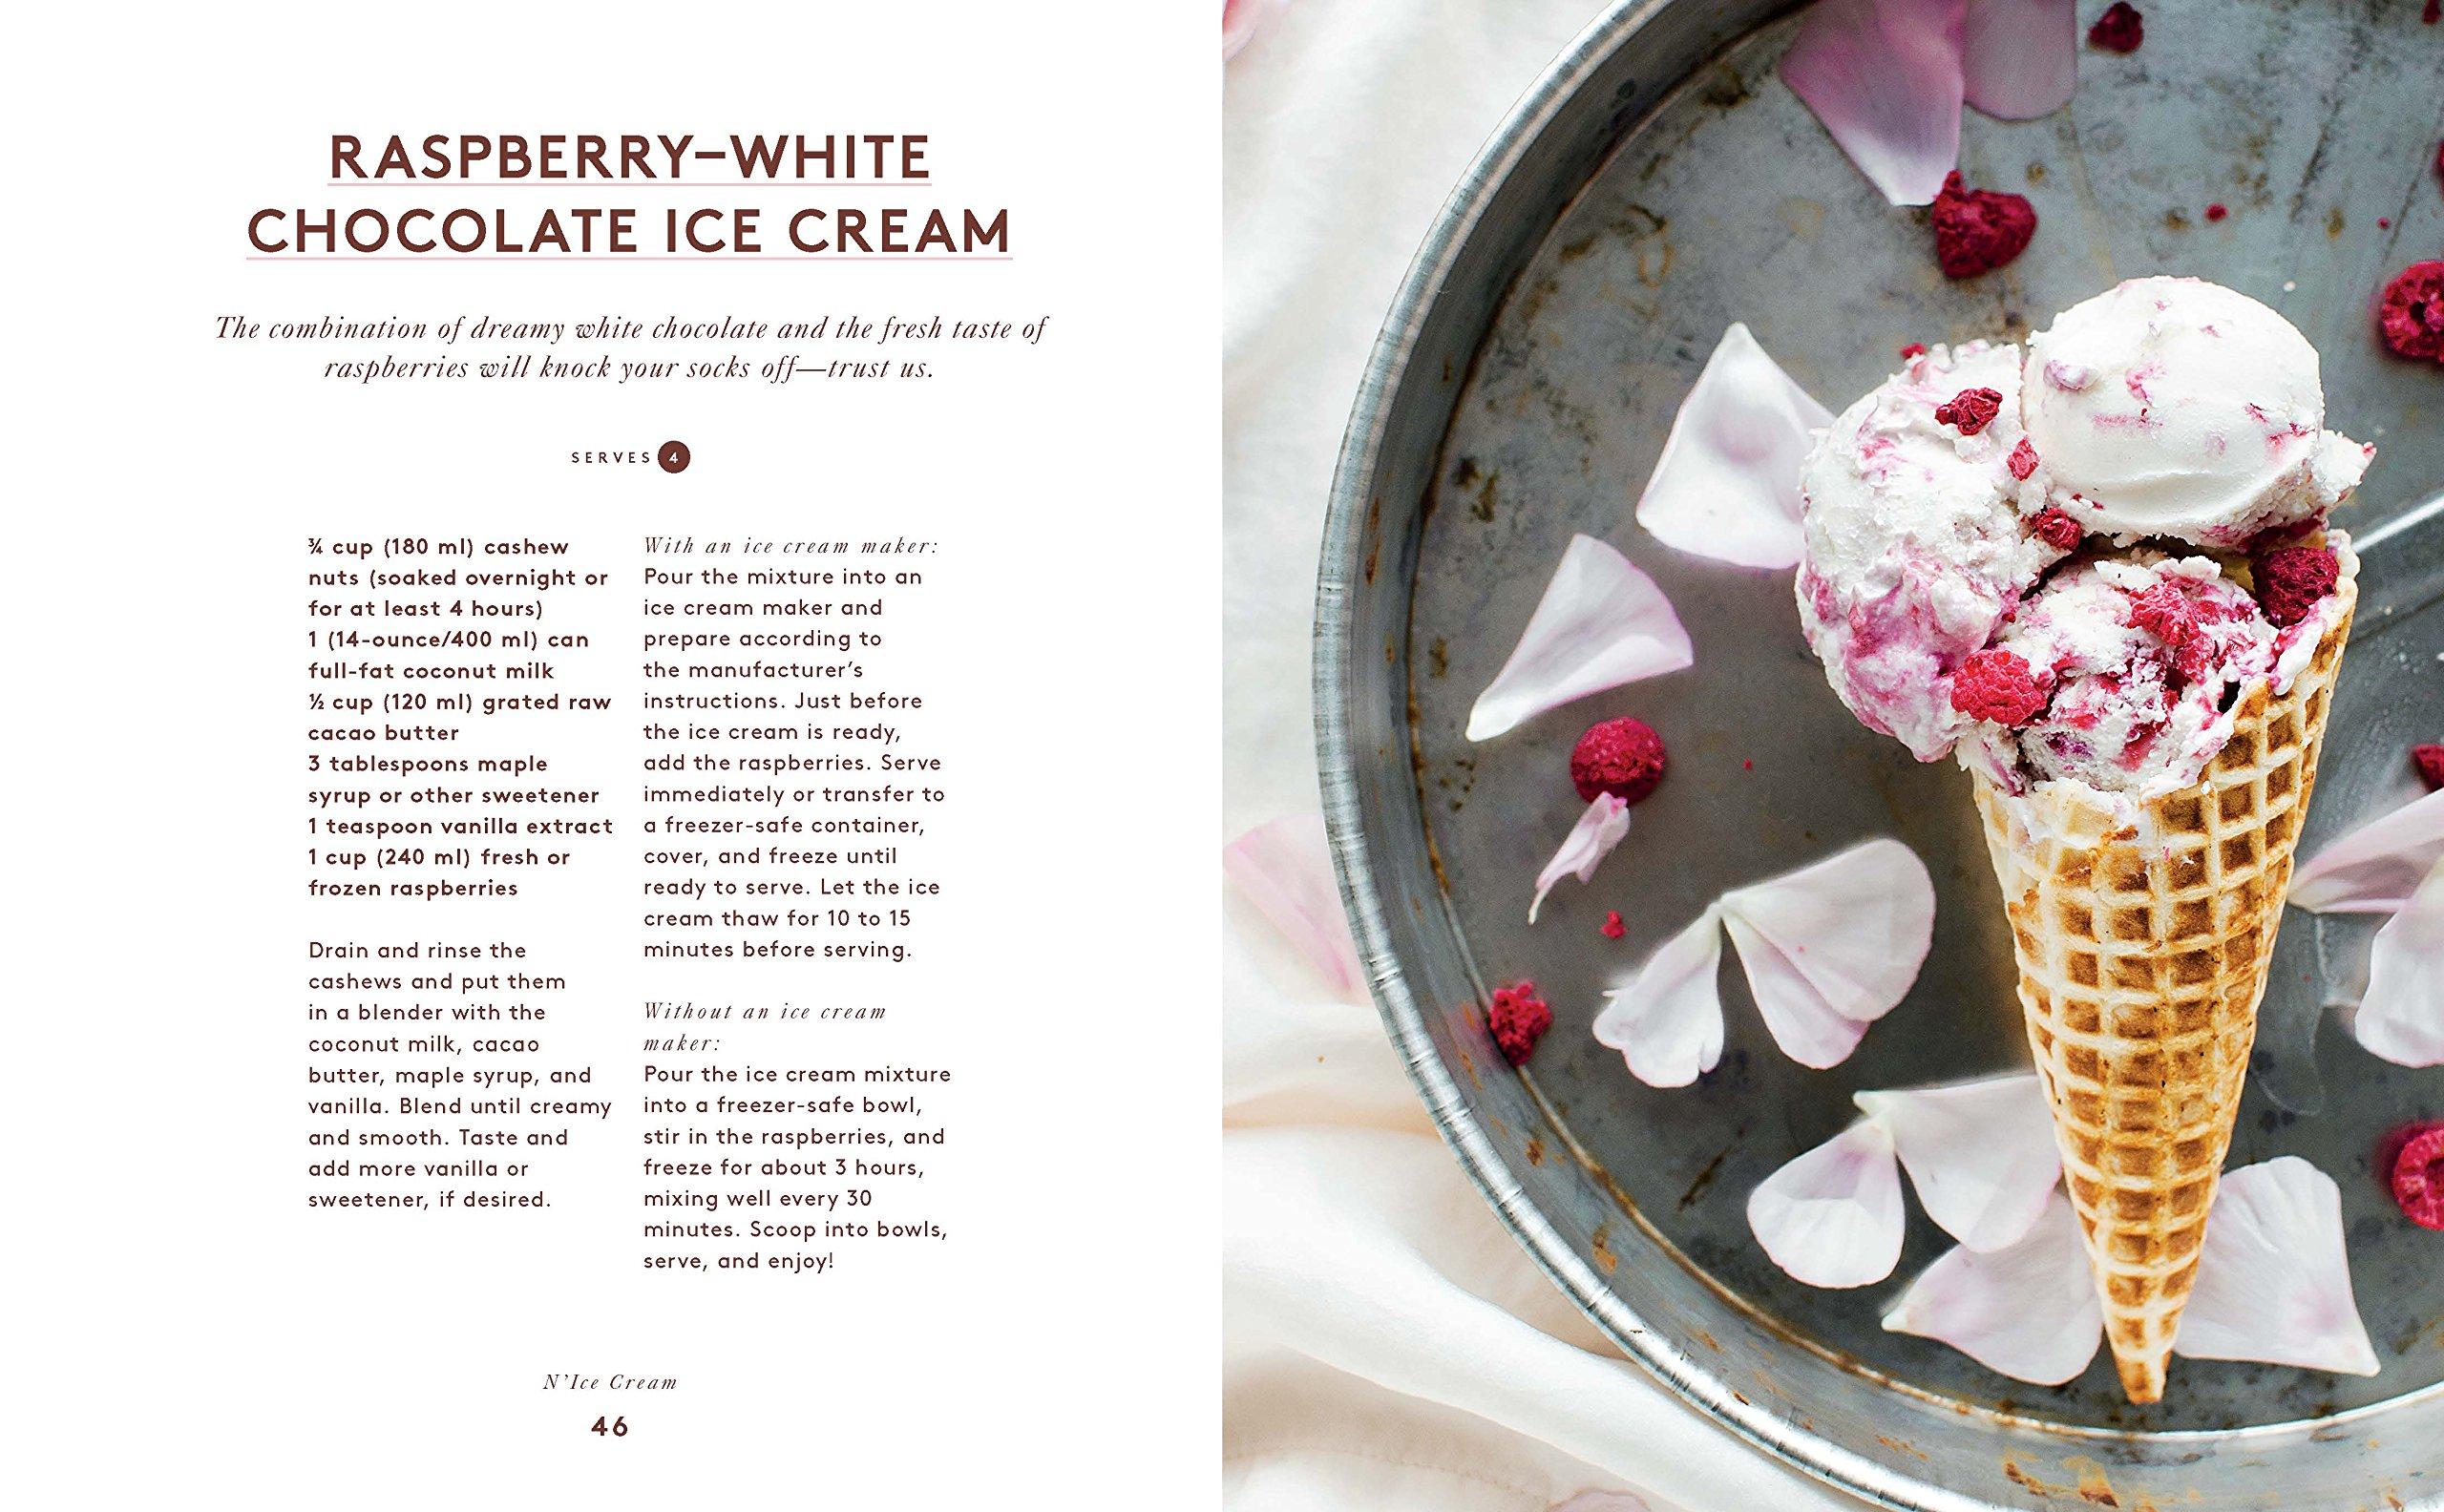 Nice cream 80 recipes for healthy homemade vegan ice creams nice cream 80 recipes for healthy homemade vegan ice creams virpi mikkonen tuulia talvio 9780735210455 amazon books ccuart Images